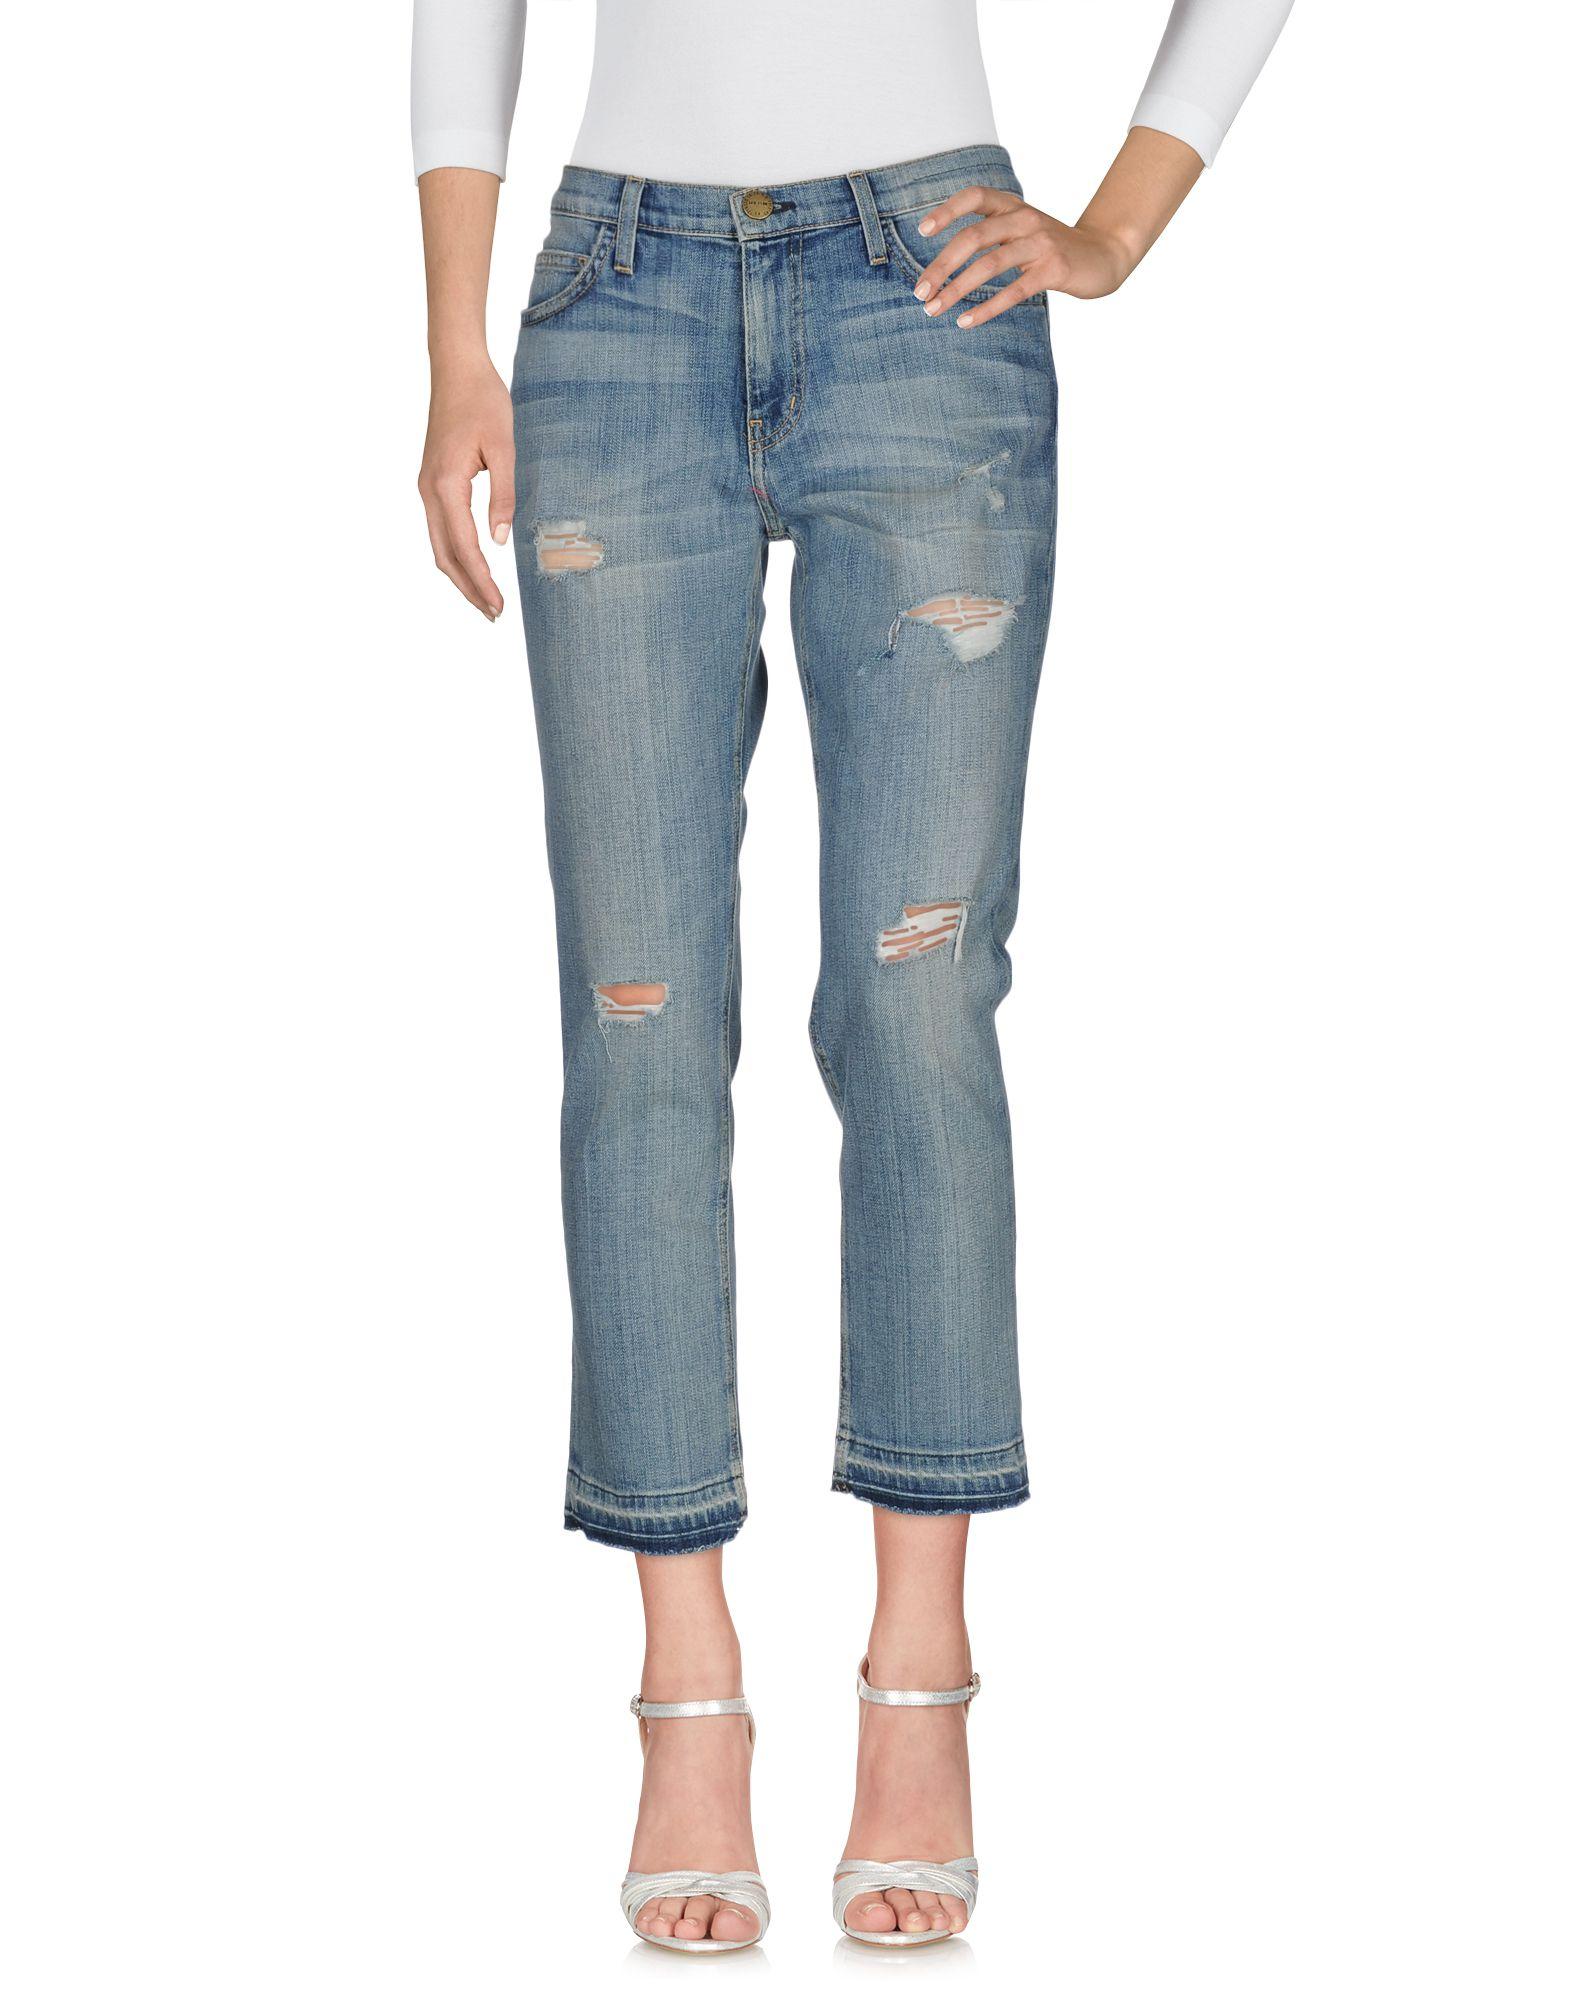 Pantaloni Jeans Current Elliott donna - 42573434QT 42573434QT 42573434QT 989